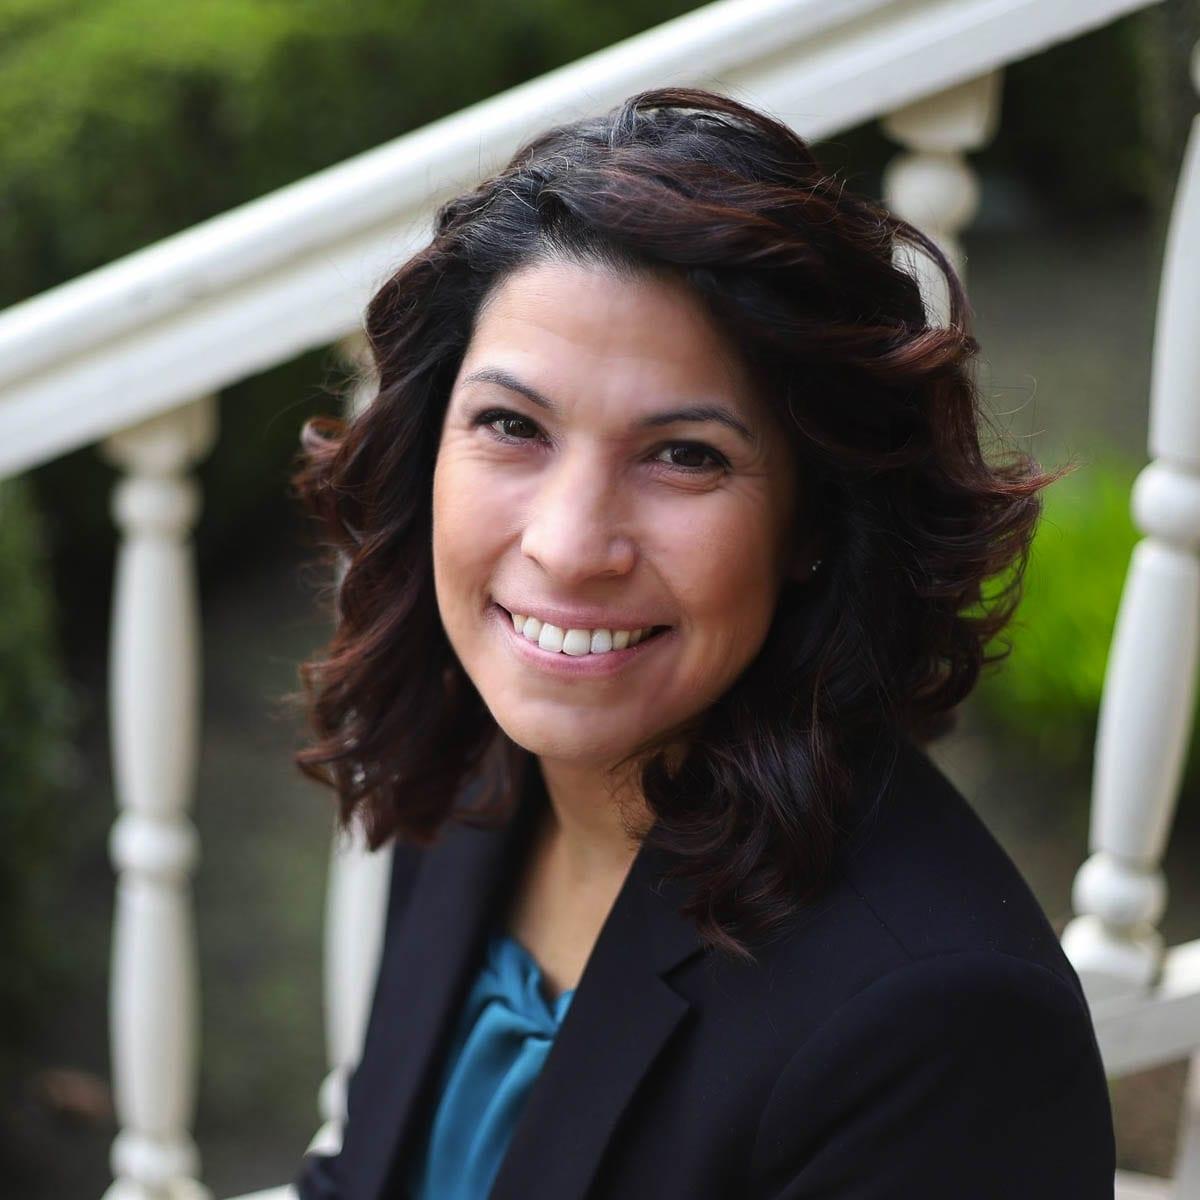 Rep. Monica Stonier, 49th District